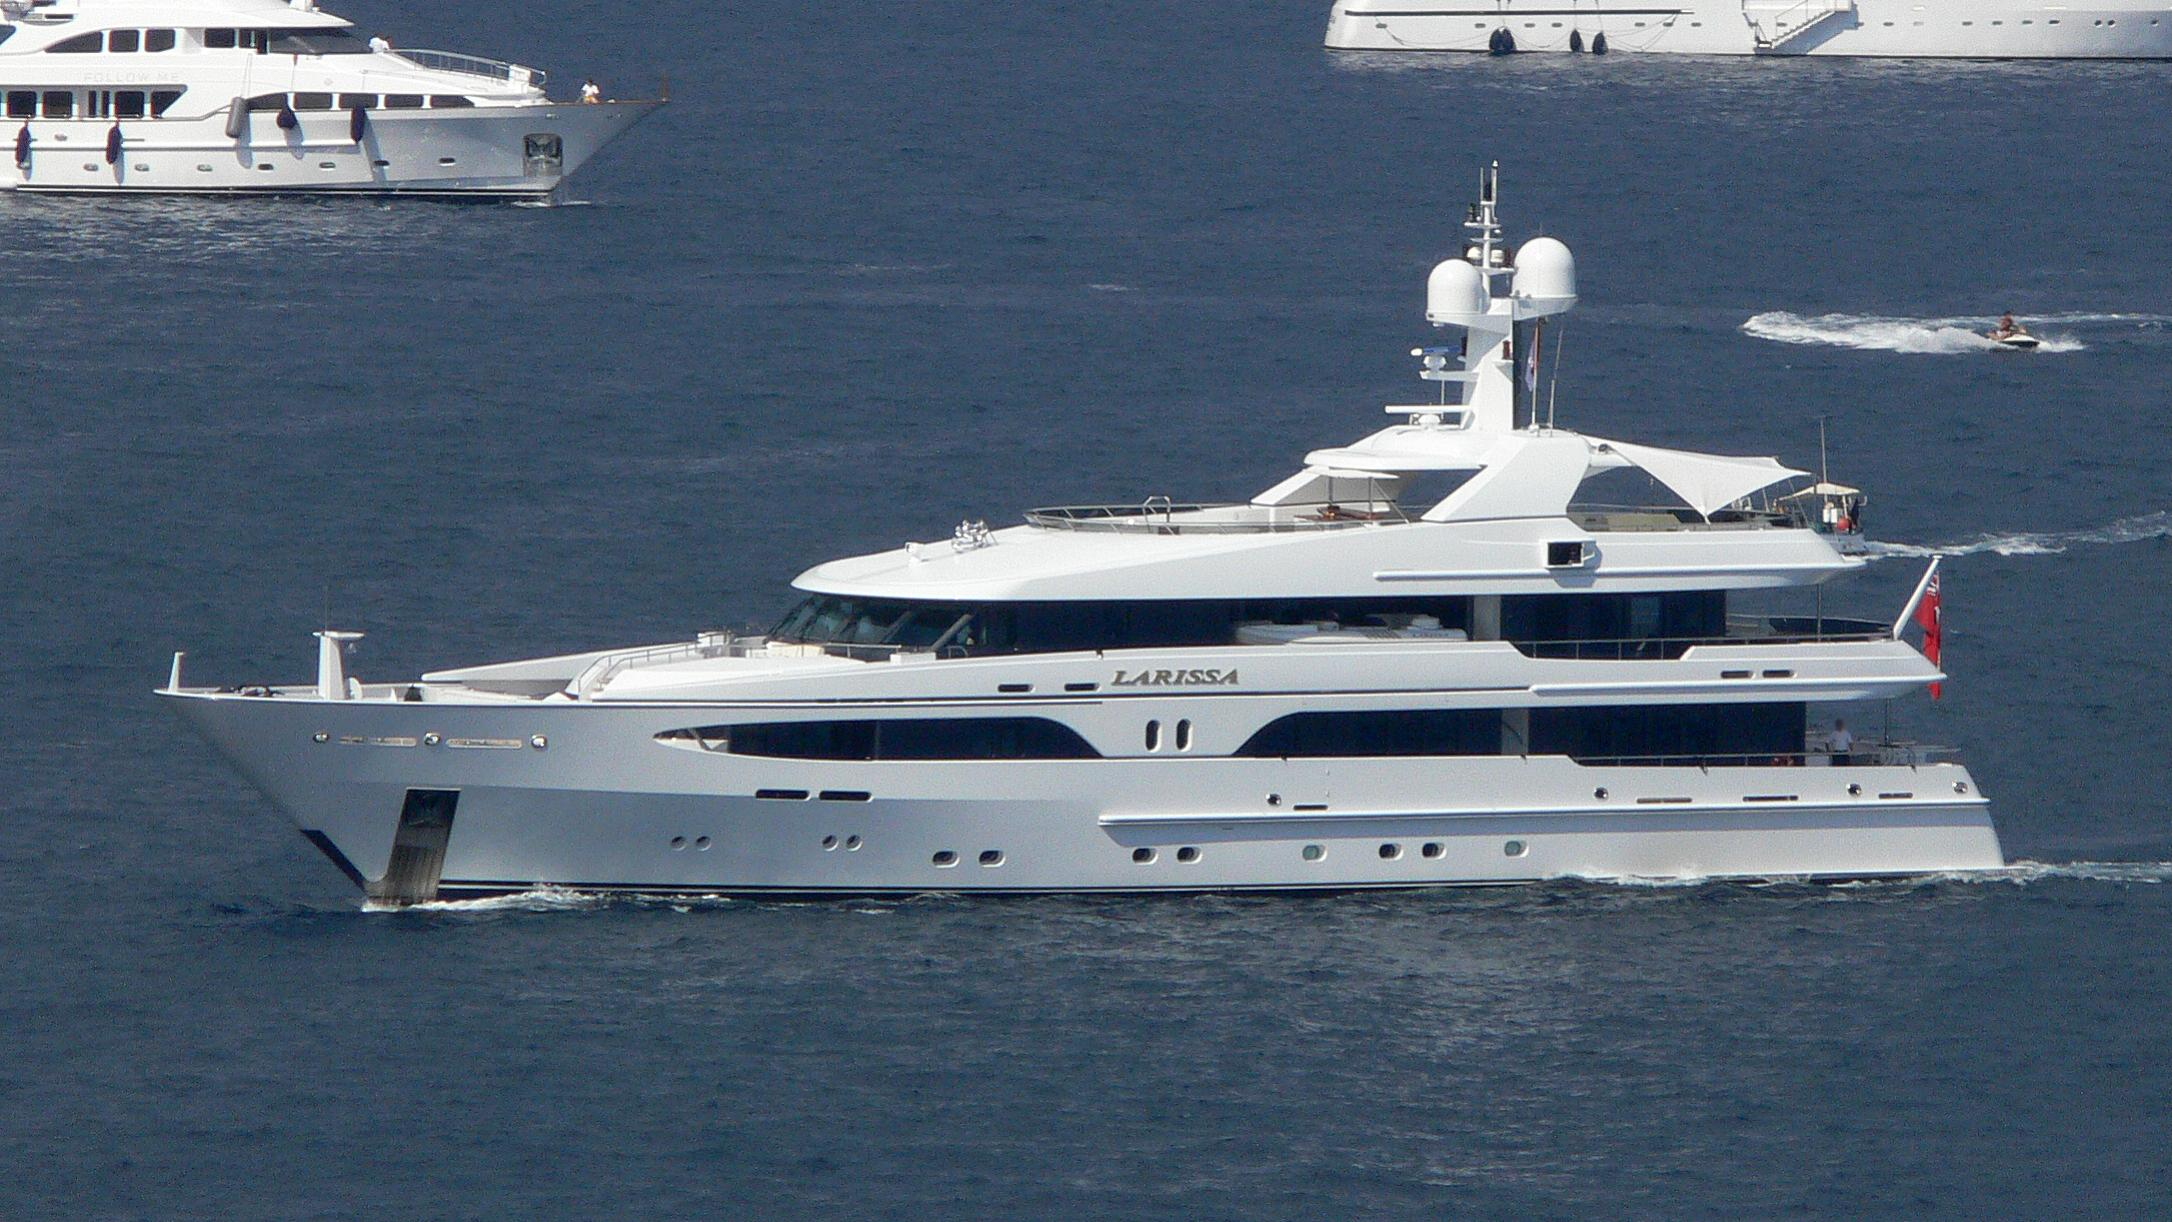 vibrance volpini motoryacht amels 49m 2004 profile